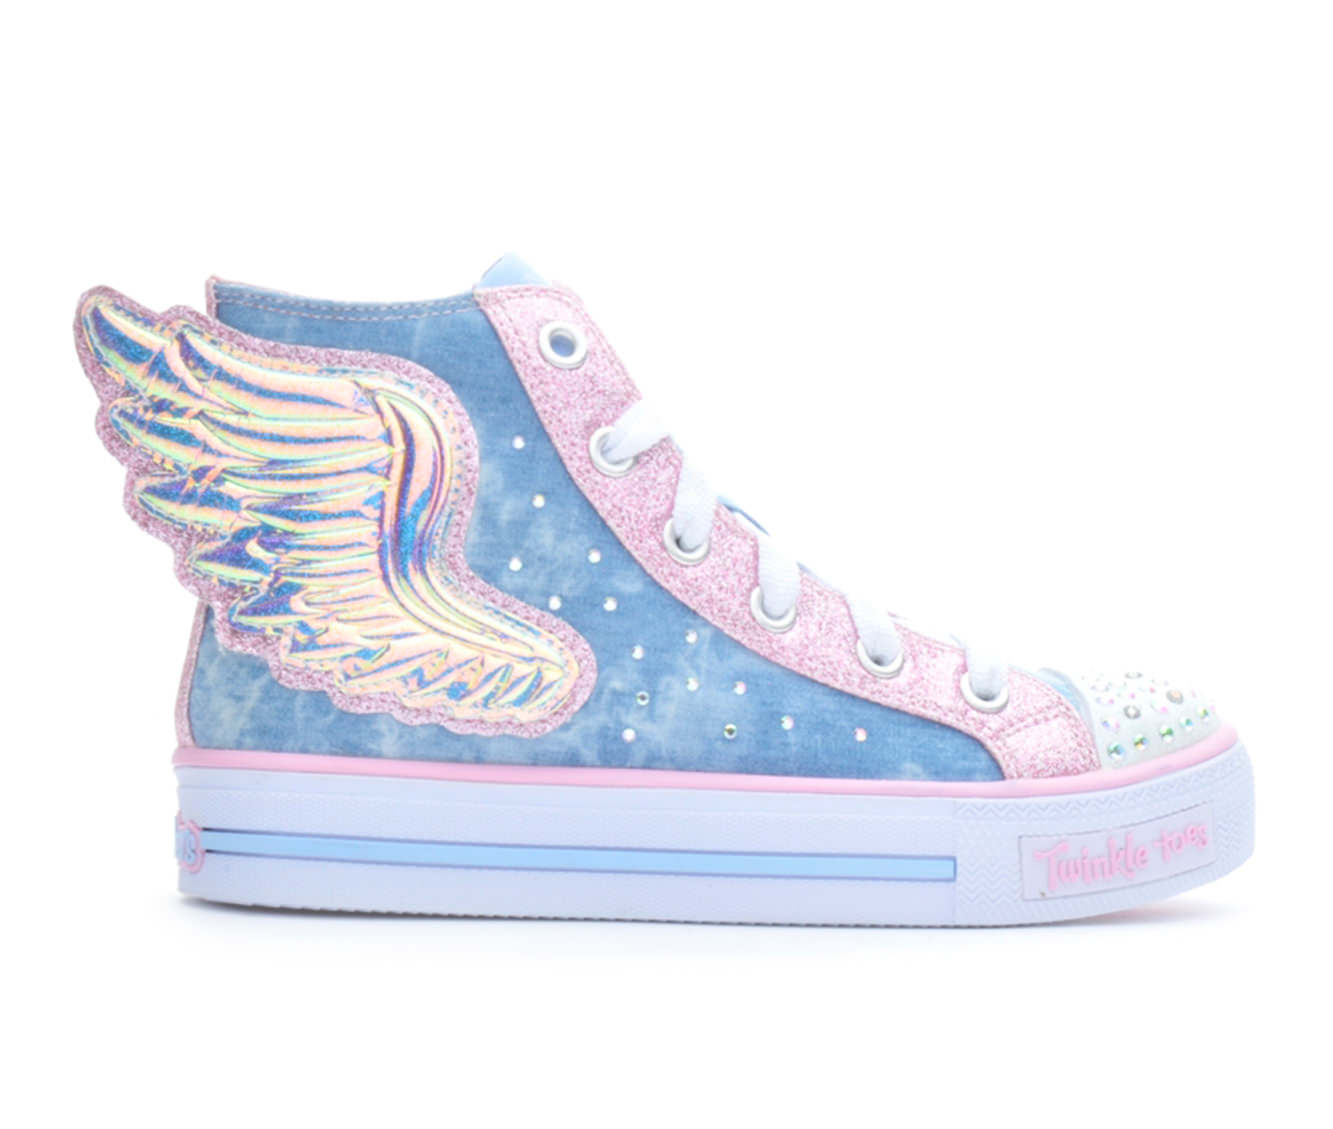 Girls' Skechers Shuffles Flutters Light-Up Sneakers (Blue)